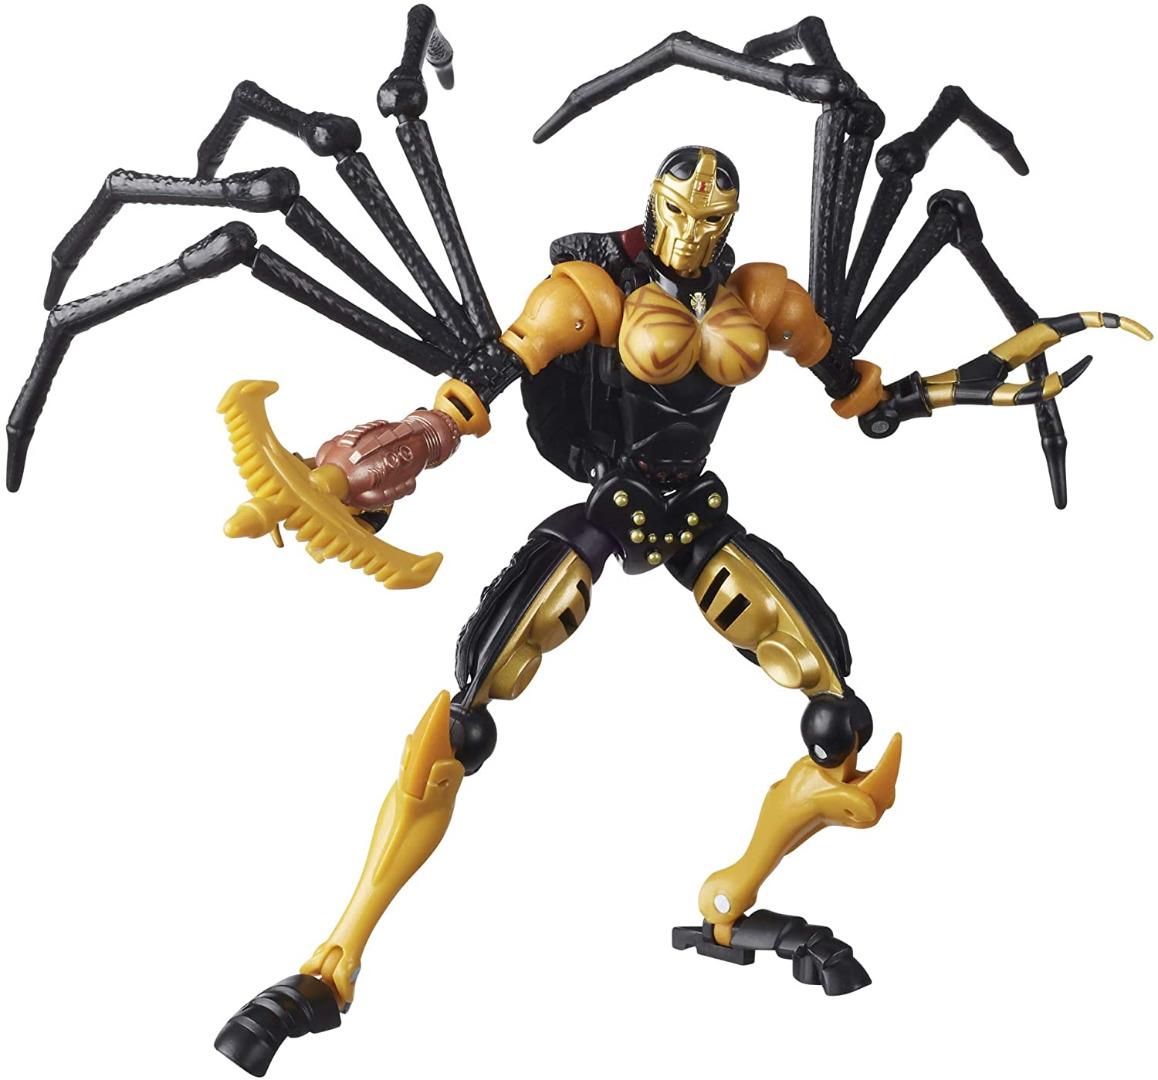 Transformers Generations War fo Cybertron Action Figure Blackarachnia 13 cm